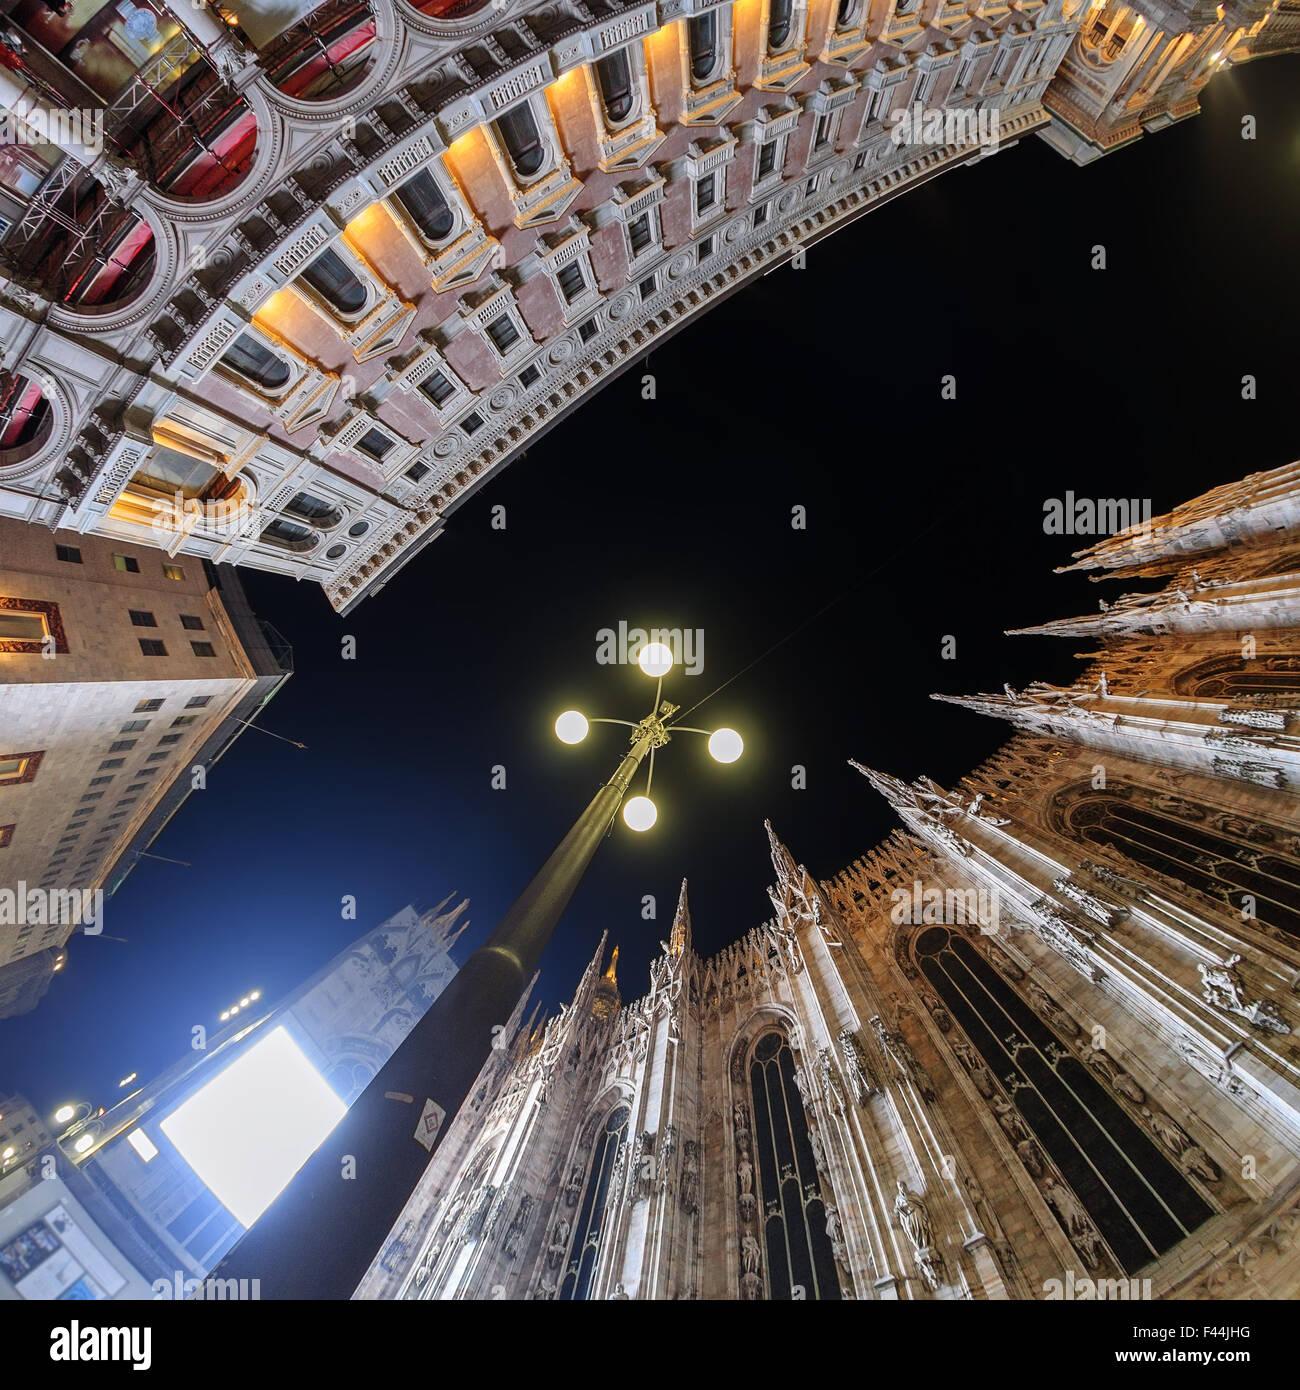 La cathédrale de Milan vue grand angle Photo Stock